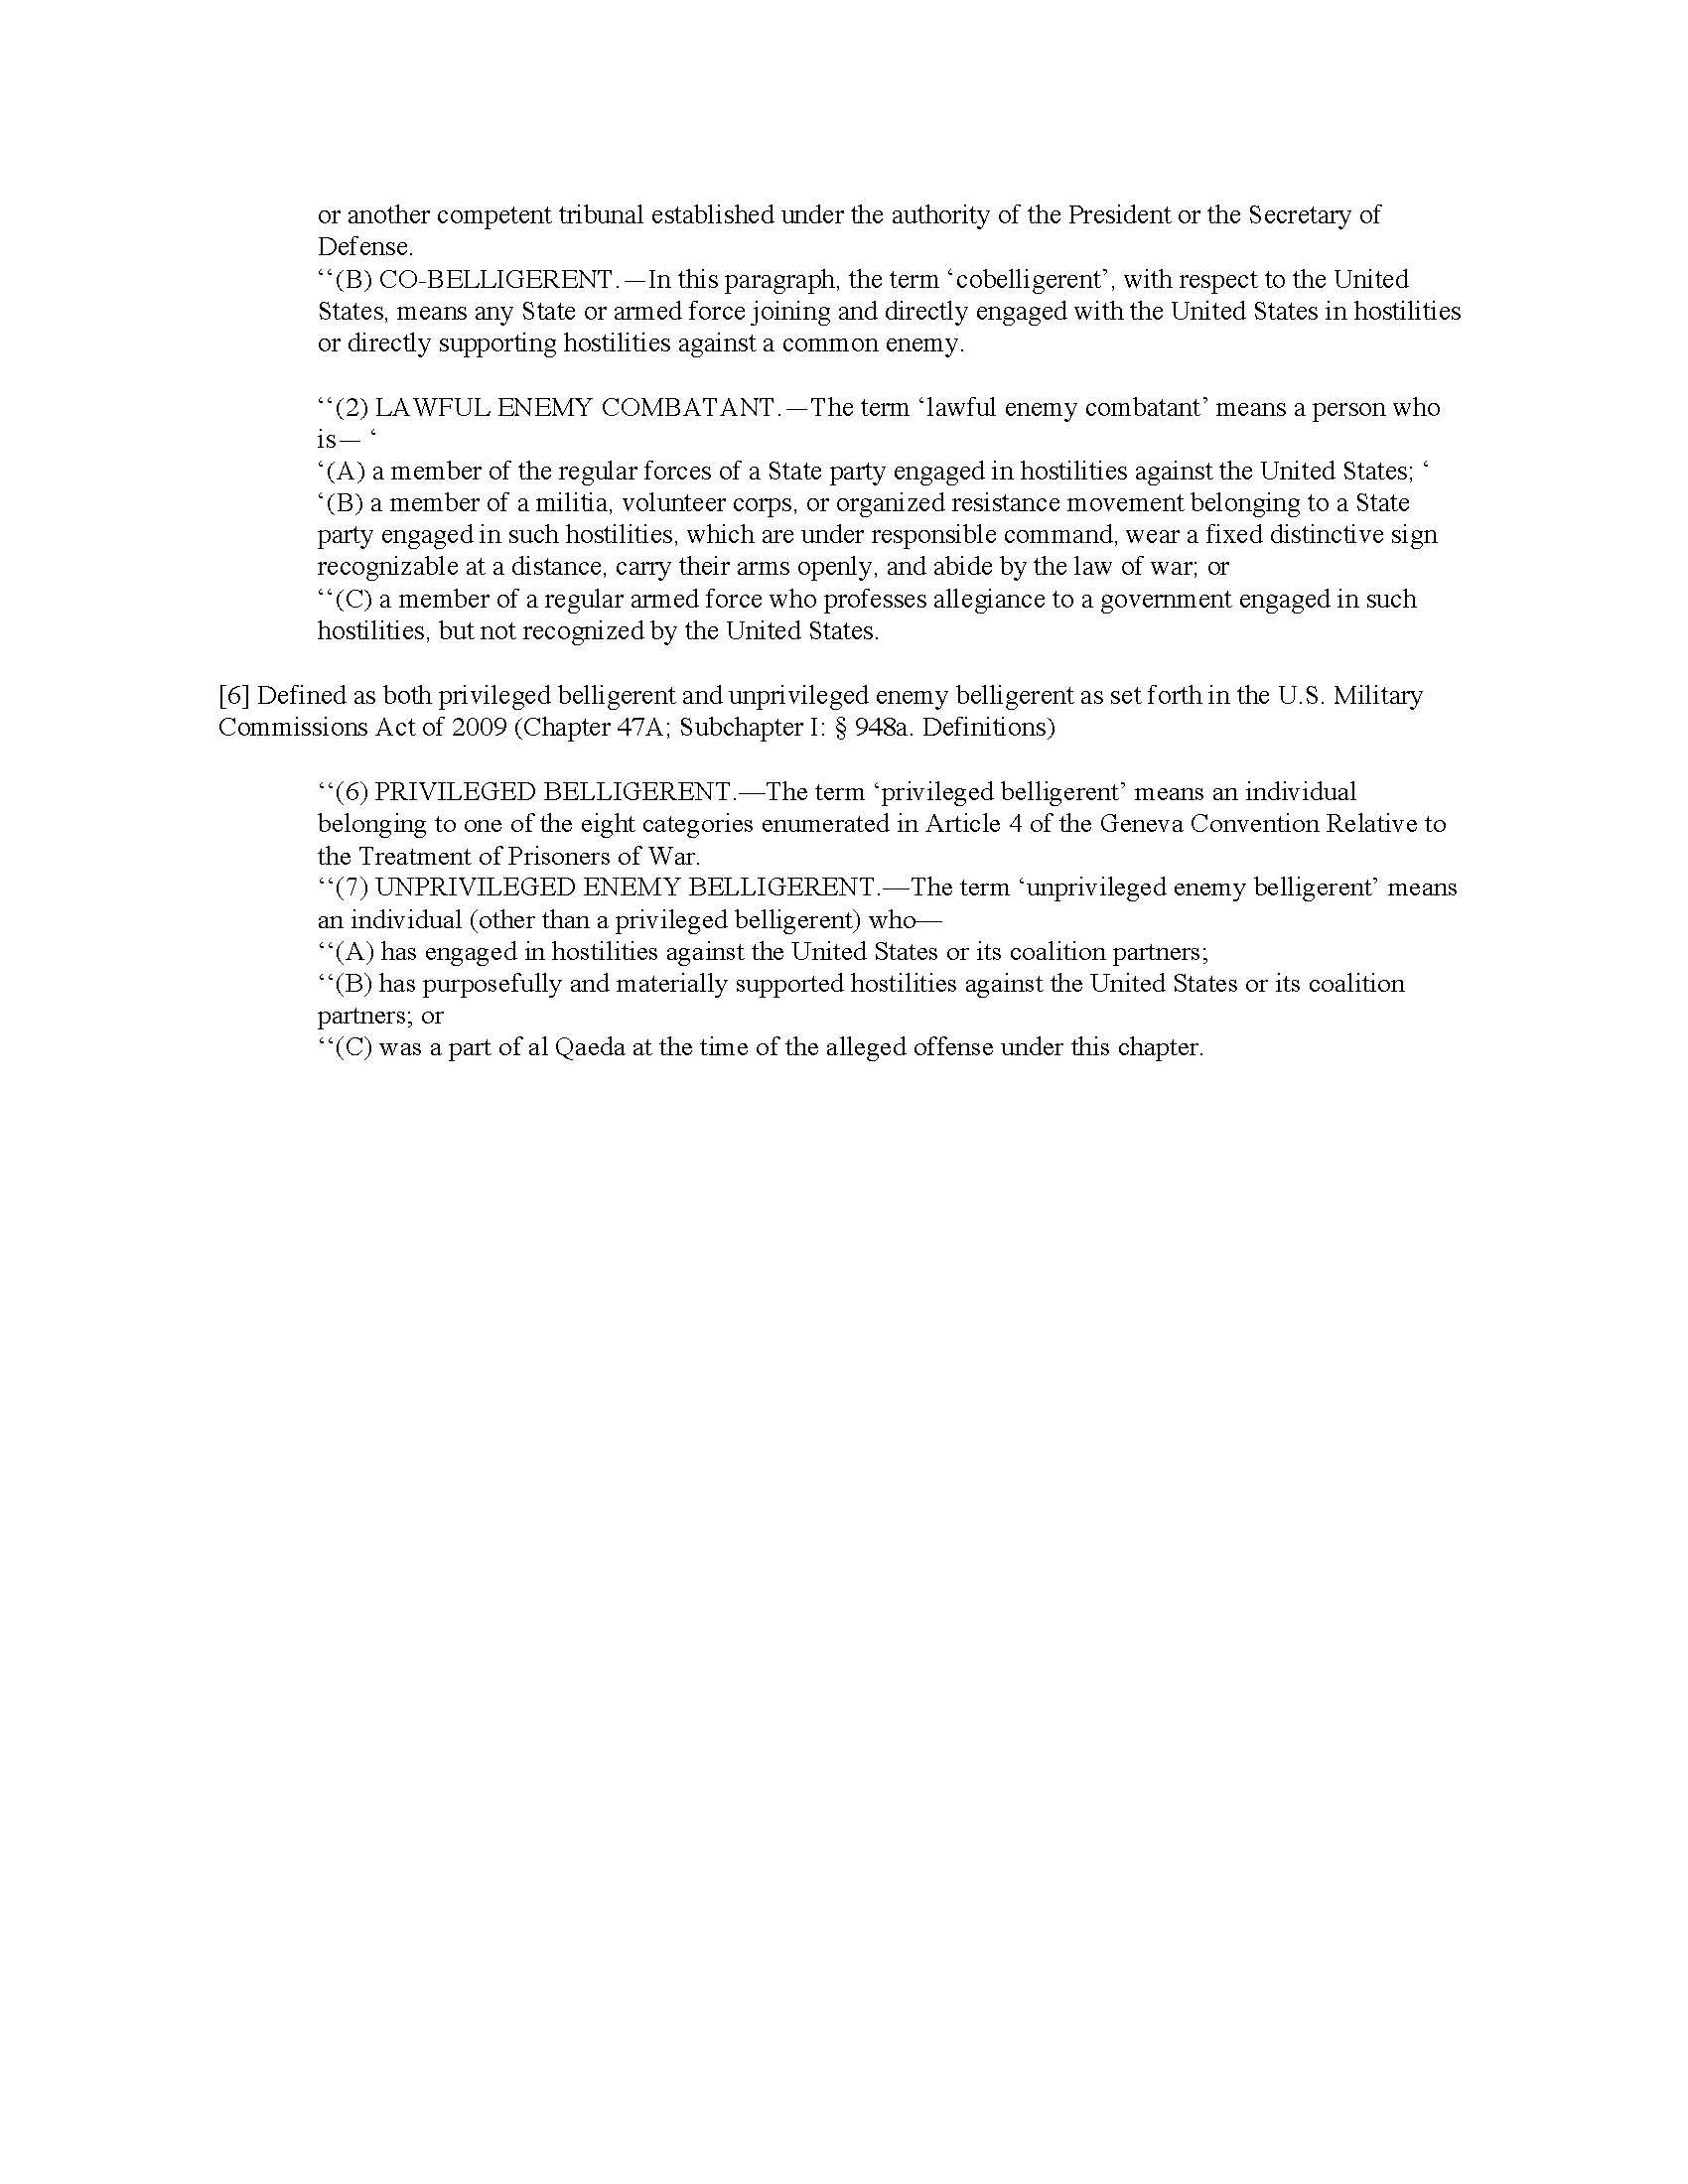 draft ii january 2013